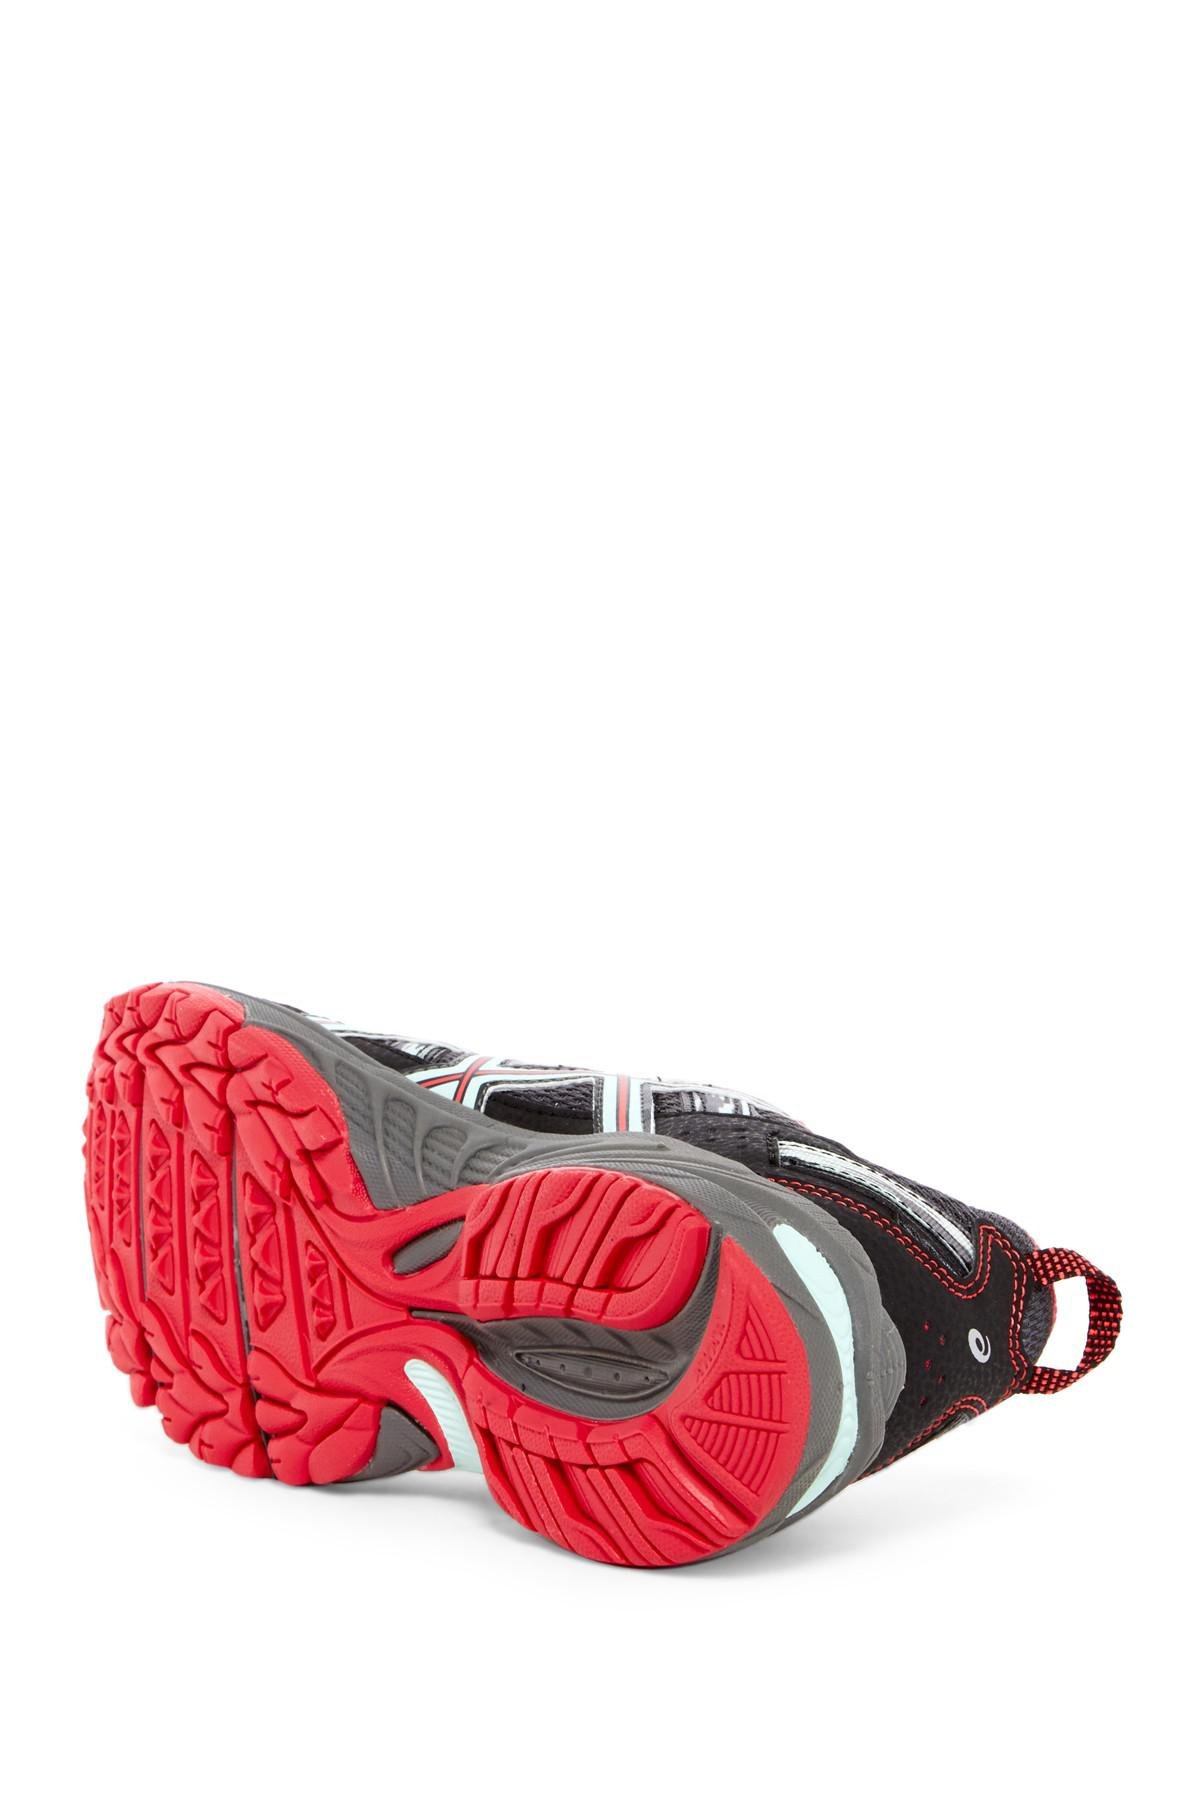 Lyst Asics 19995 Asics Sneaker Gel venture Running Sneaker 4b7827d - resepmasakannusantara.website